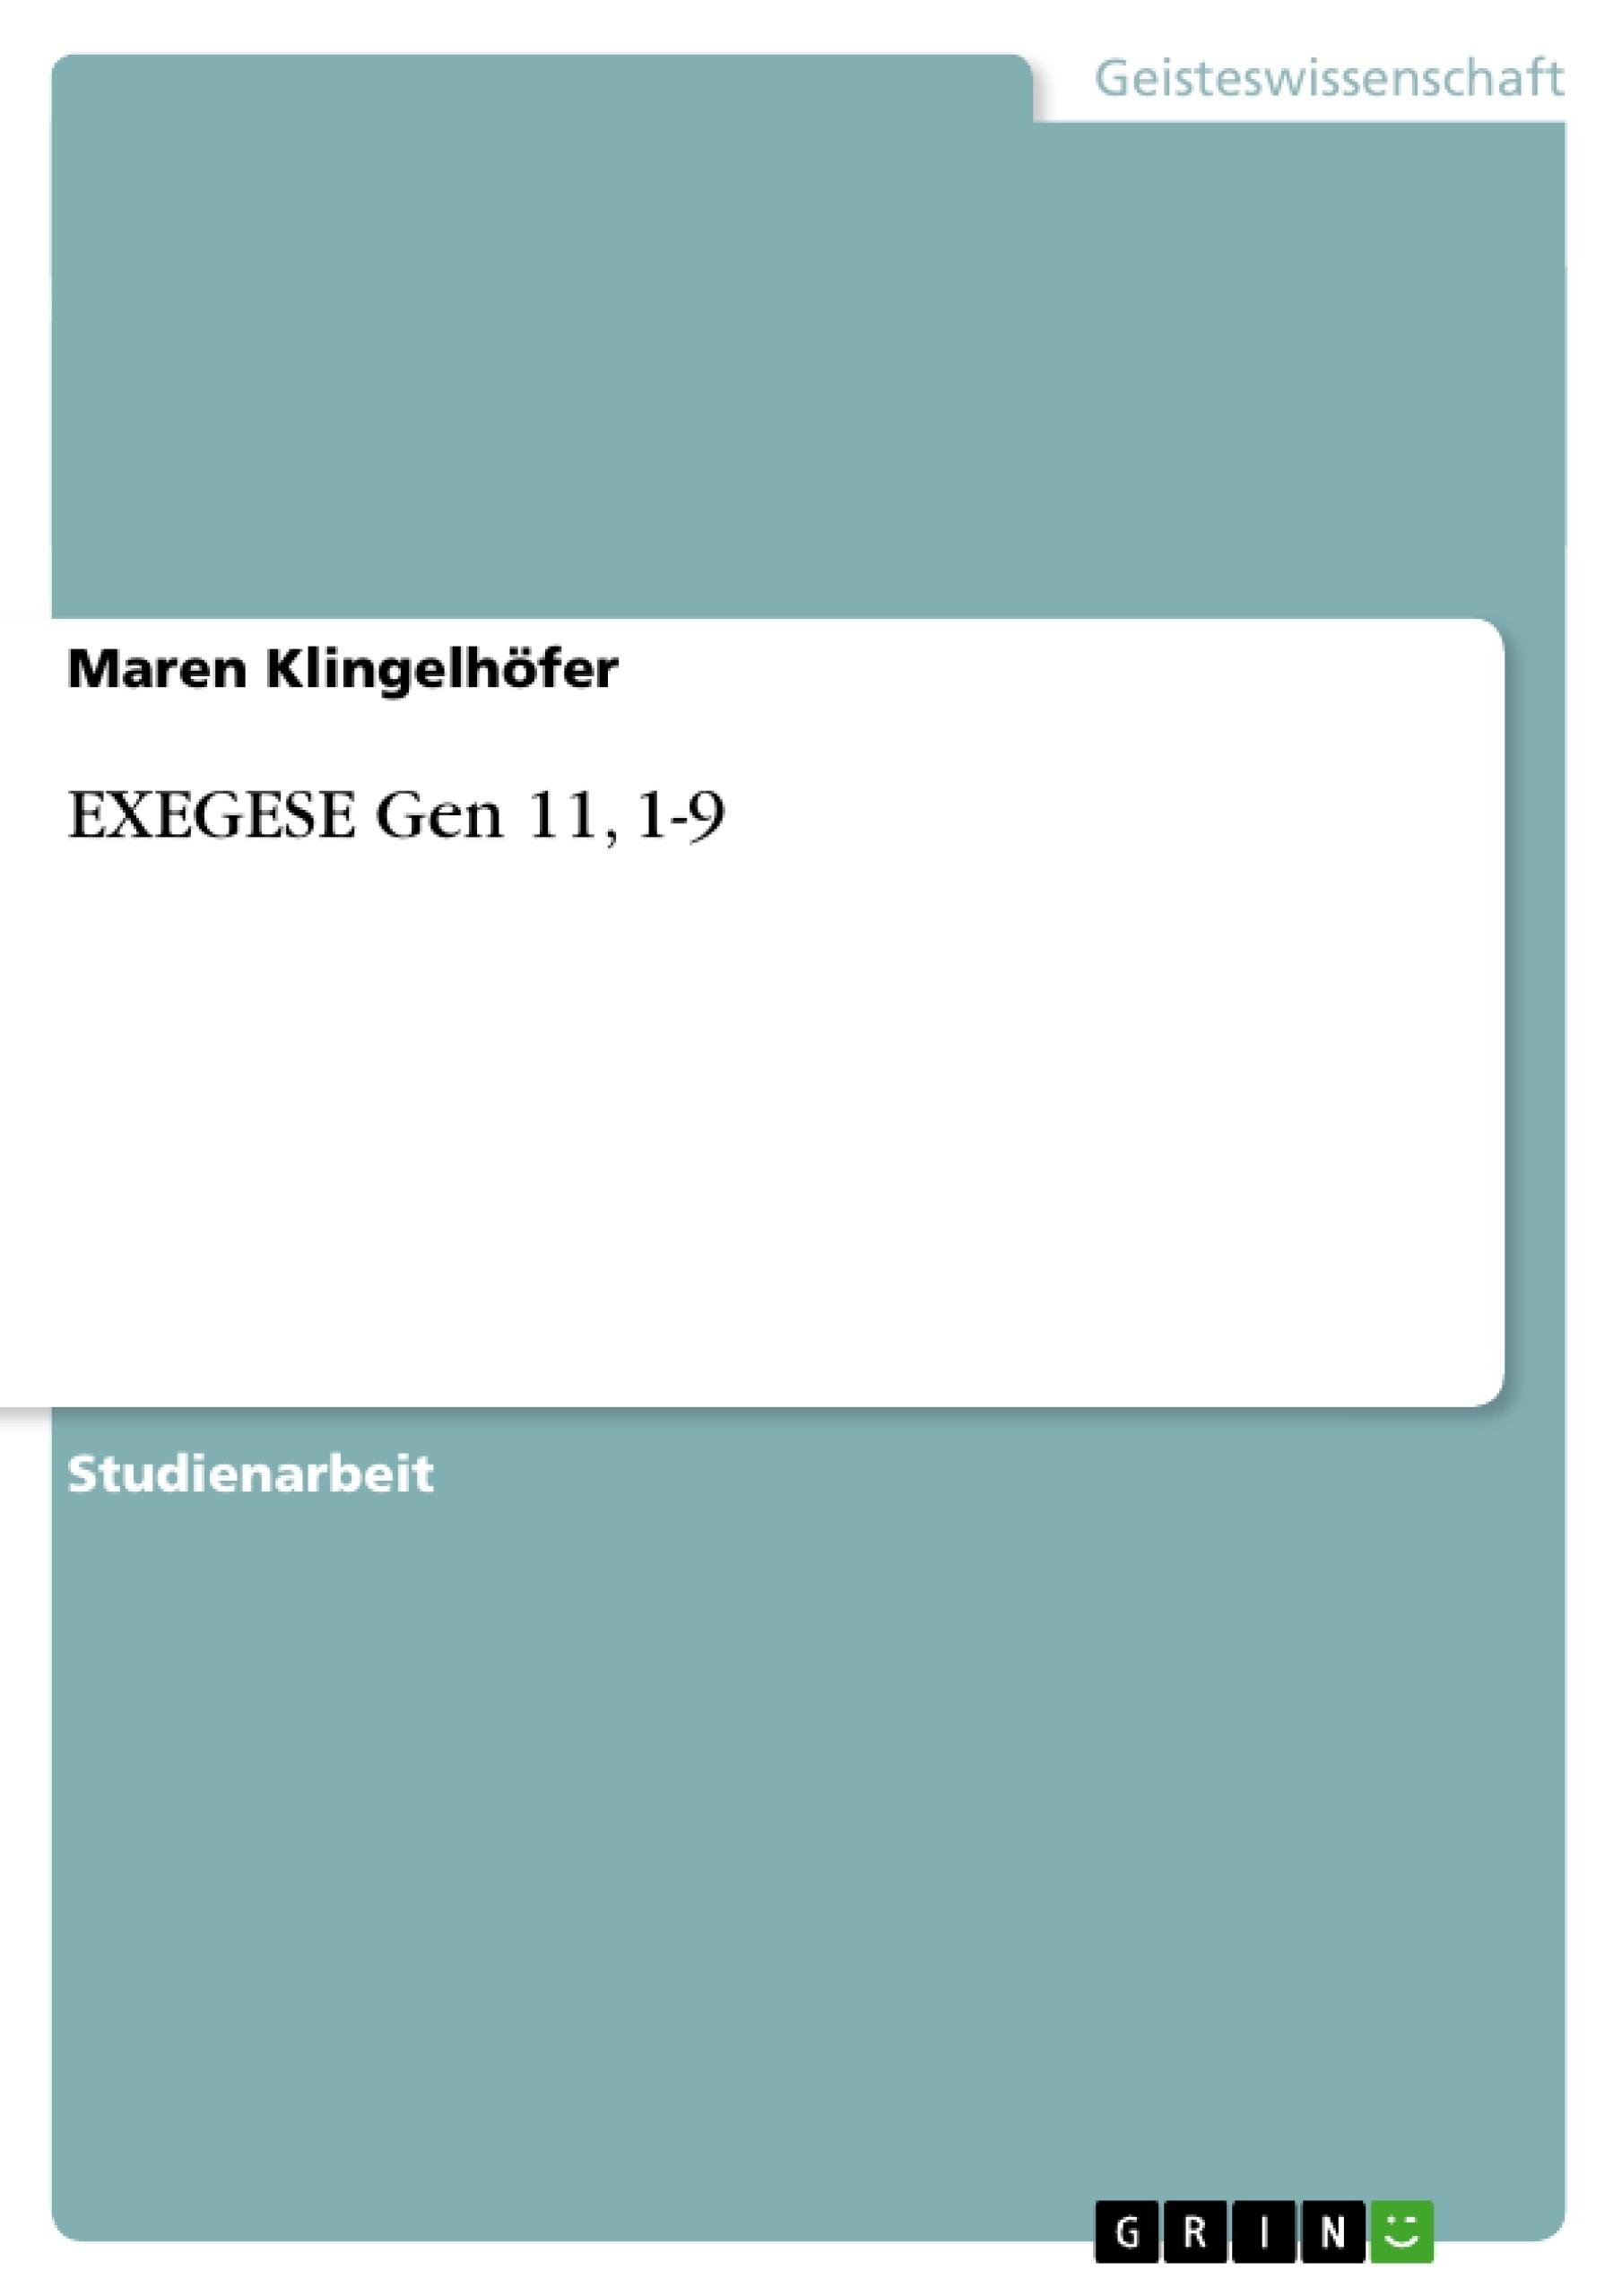 Titel: EXEGESE Gen 11, 1-9